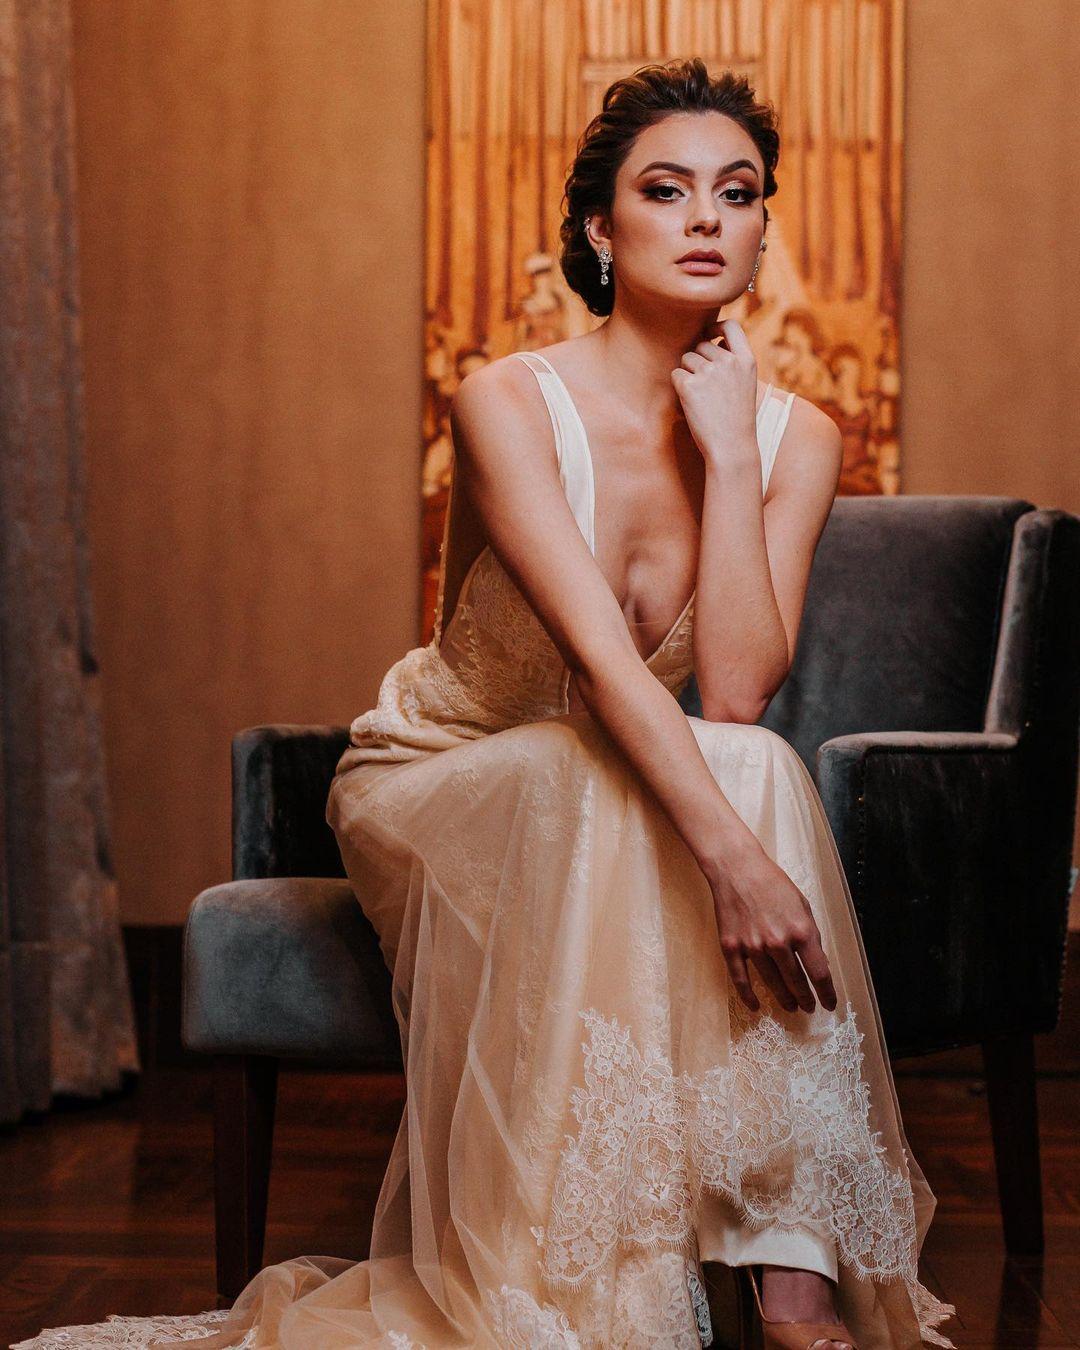 thais bonome, miss beleza da grande sao paulo 2020/miss abcd mundo 2019. 12626215